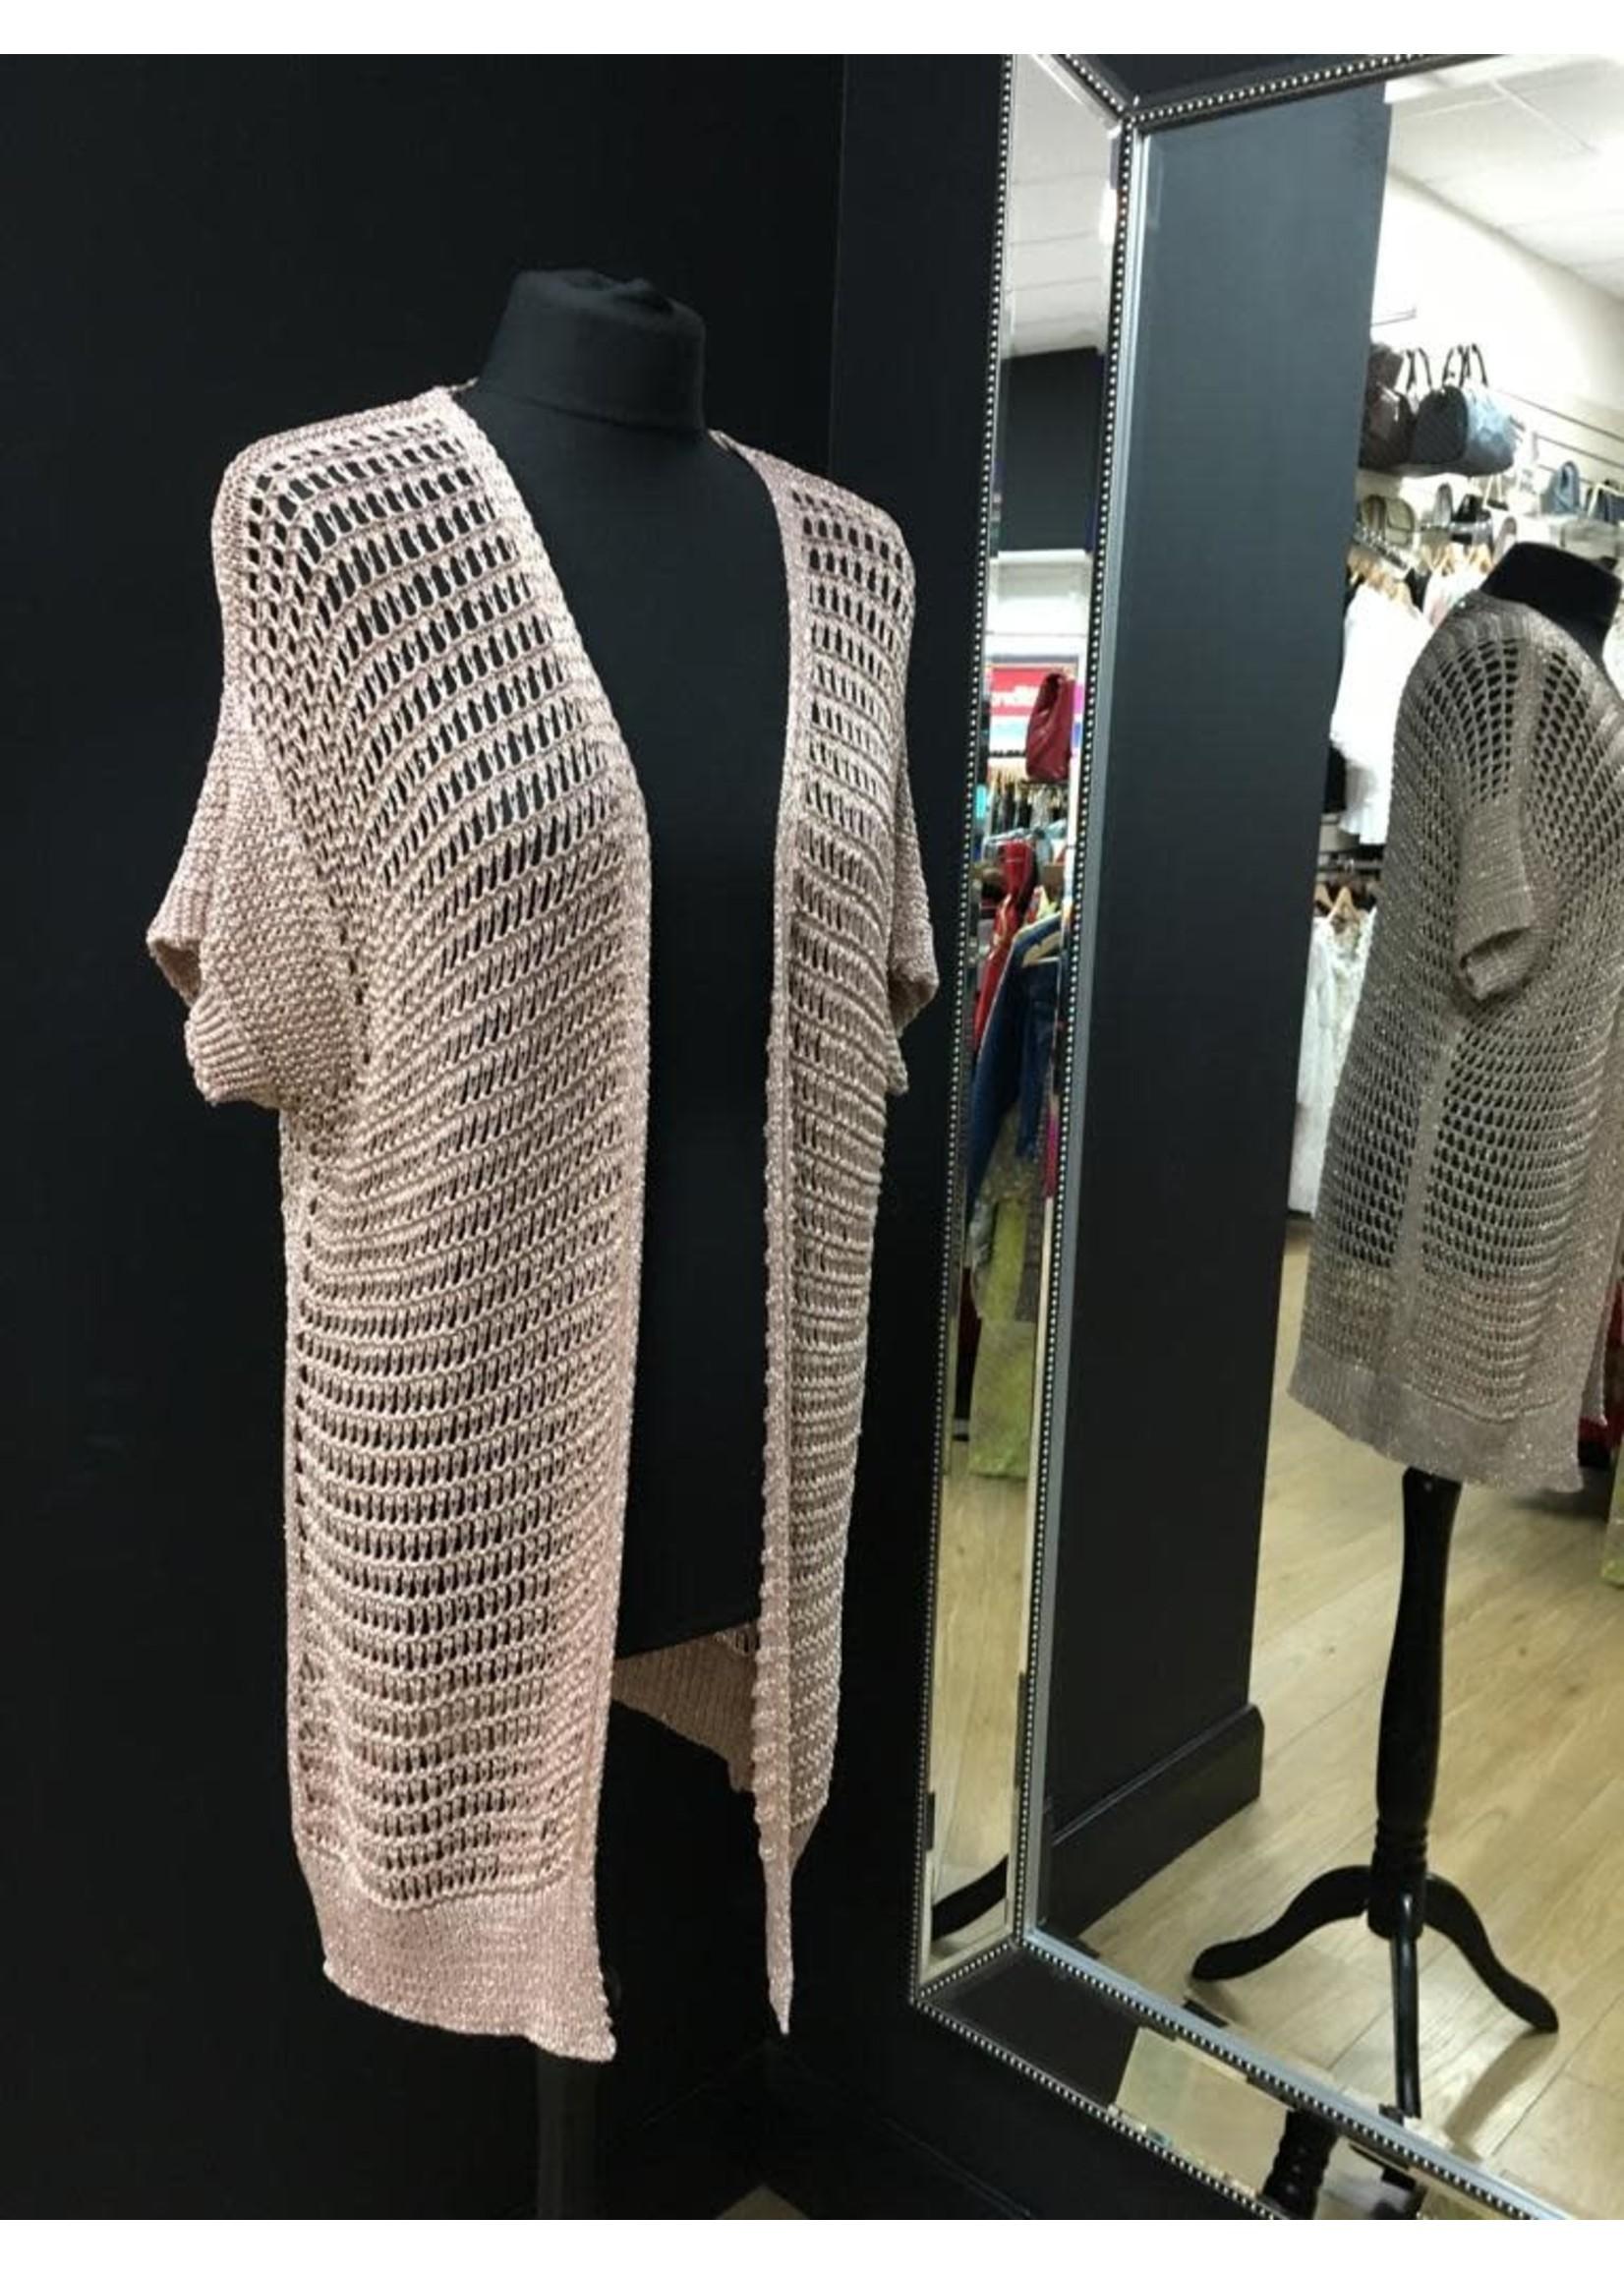 Sophie Metallic short sleeve cardigan